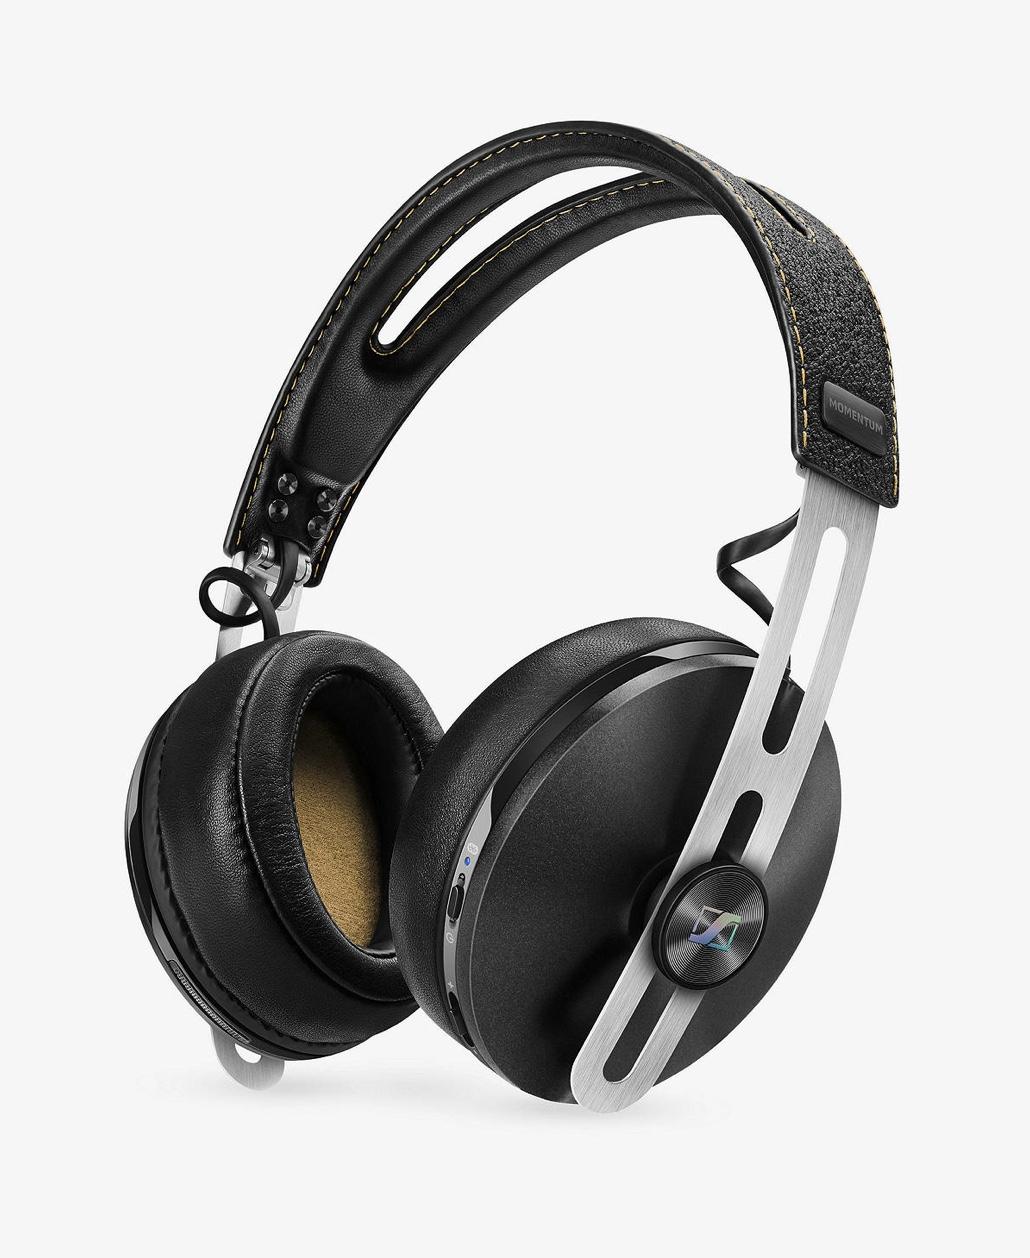 Sennheiser Momentum 2.0 Over-Ear Wireless Headphones - Black £119.99 @ Amazon